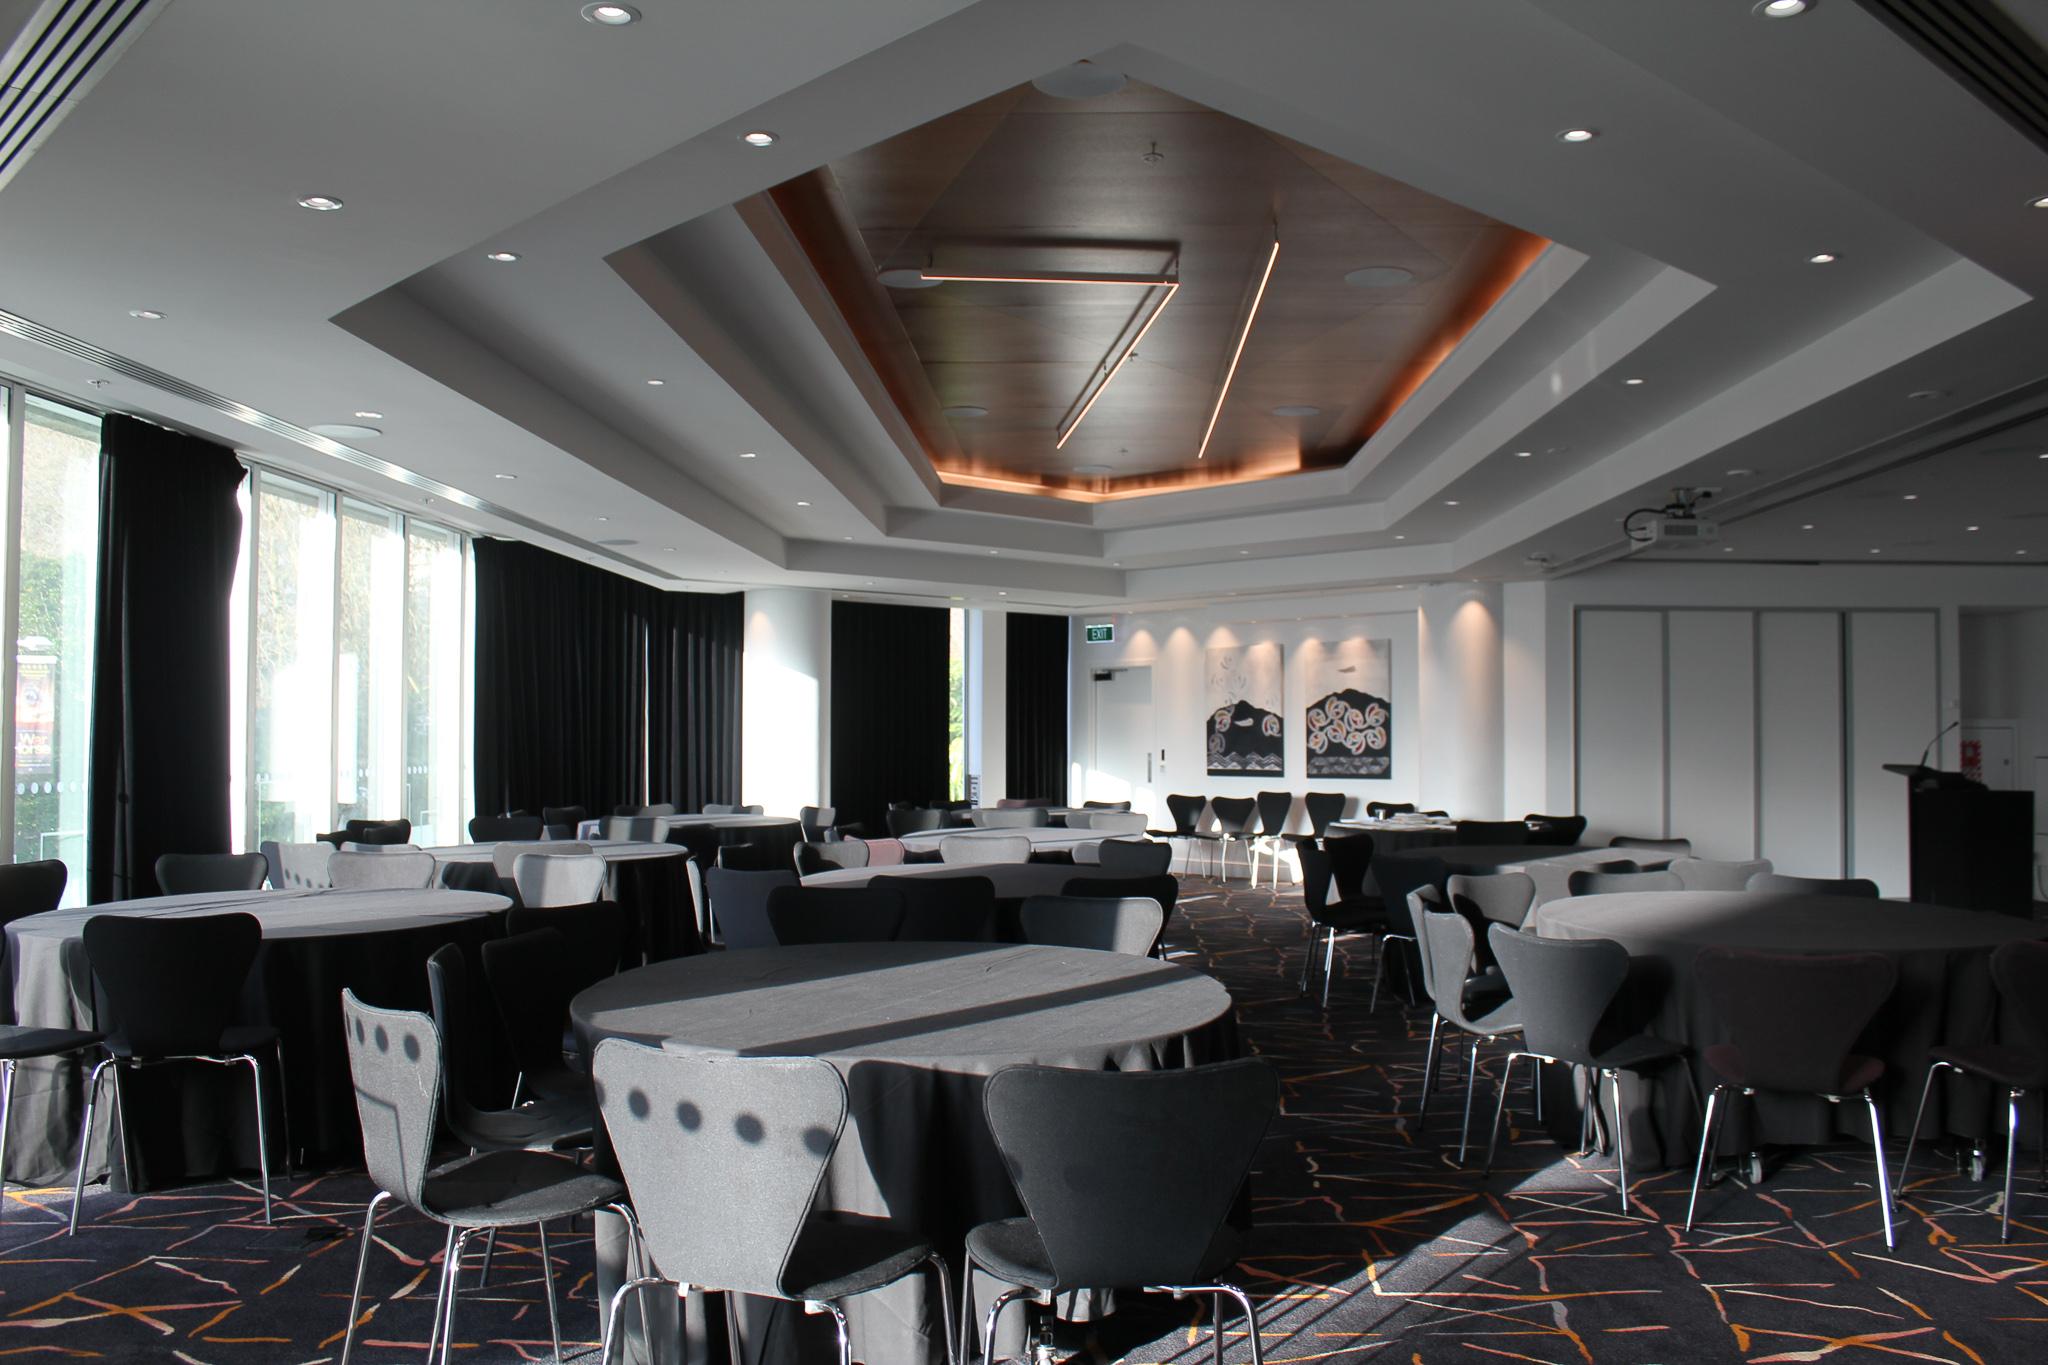 https://rfacdn.nz/conventions/assets/media/aotea-centre-waihorotiu-1-banquet-2.jpg